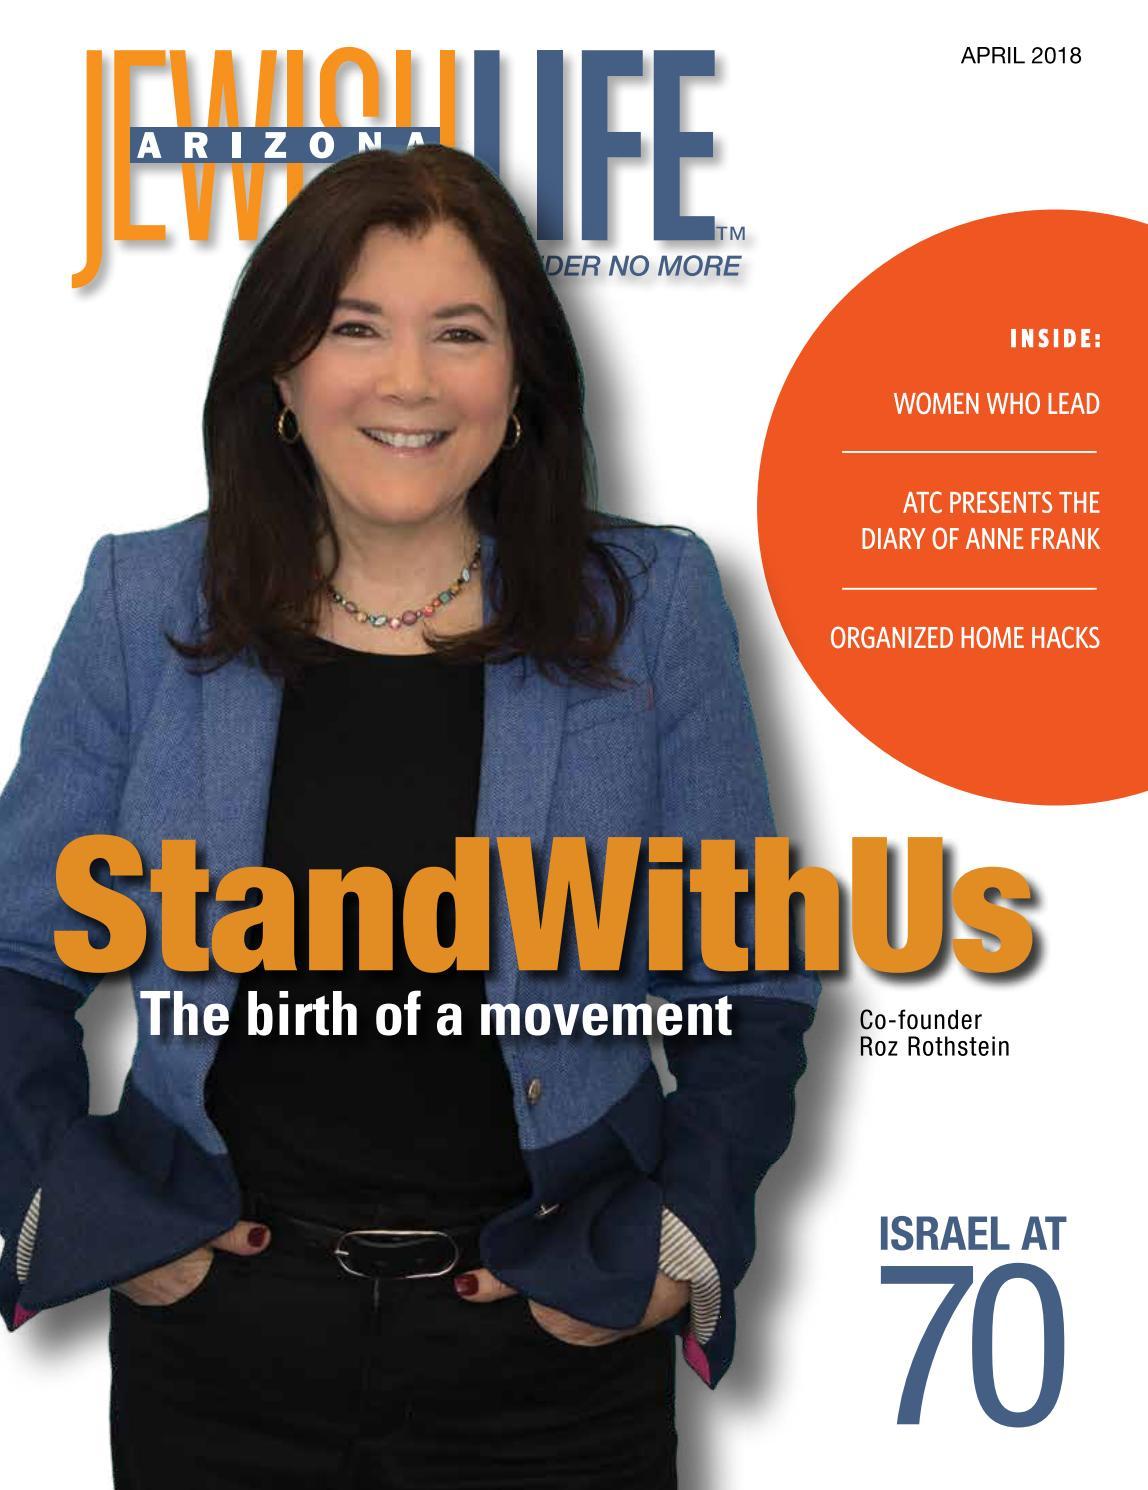 fe7fa51ea92f Arizona Jewish Life April 2018 Vol. 6 Issue 7 by JewishLifeMagazine ...